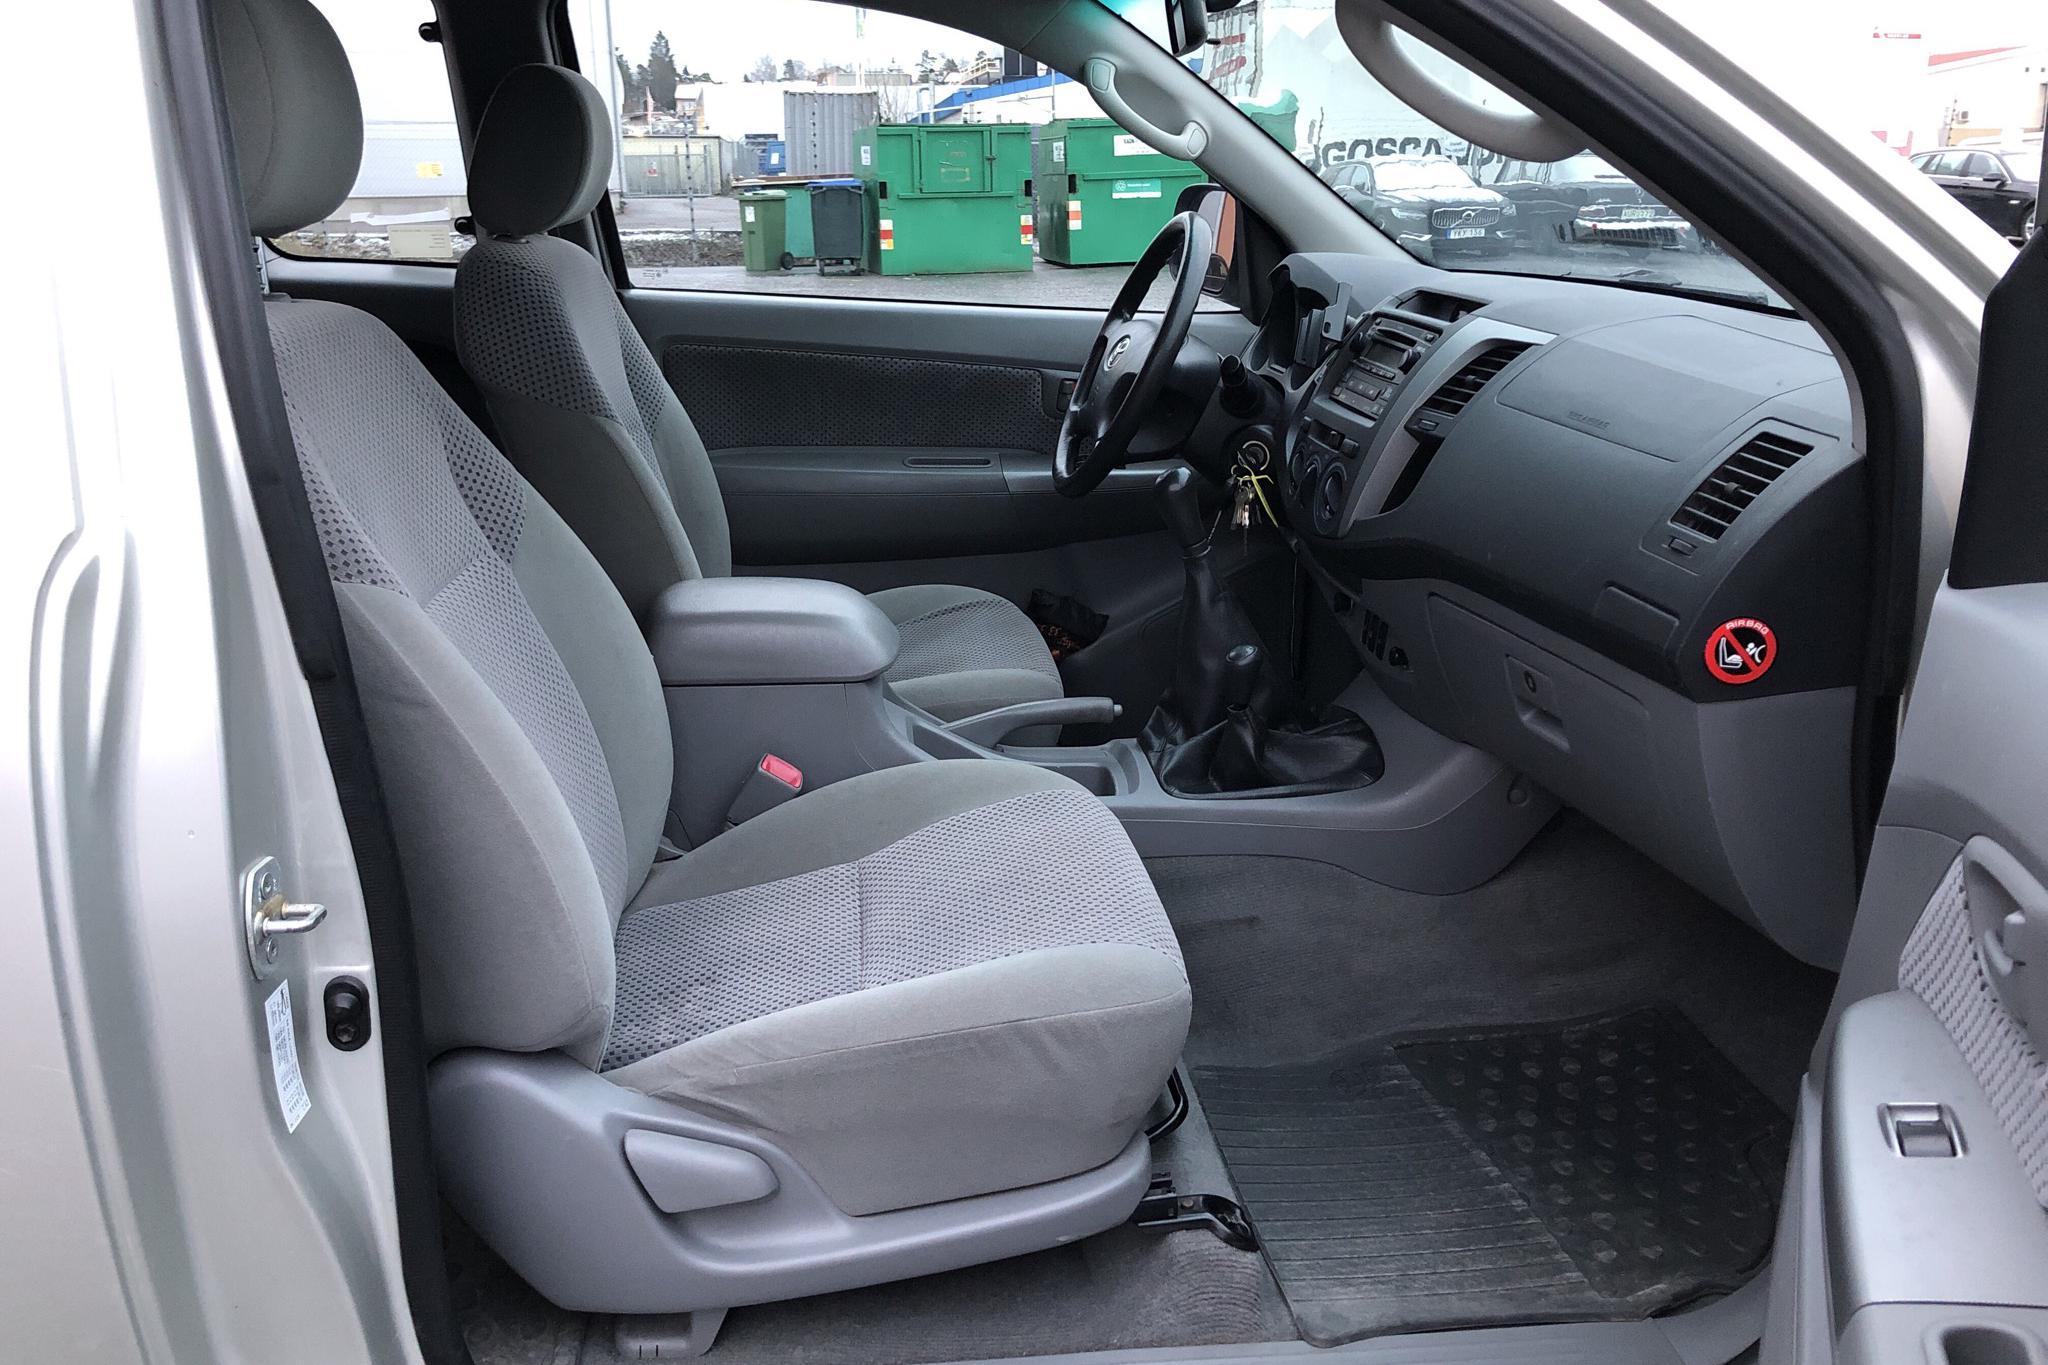 Toyota Hilux 2.5 D-4D 4WD (102hk) - 21 138 mil - Manuell - silver - 2006